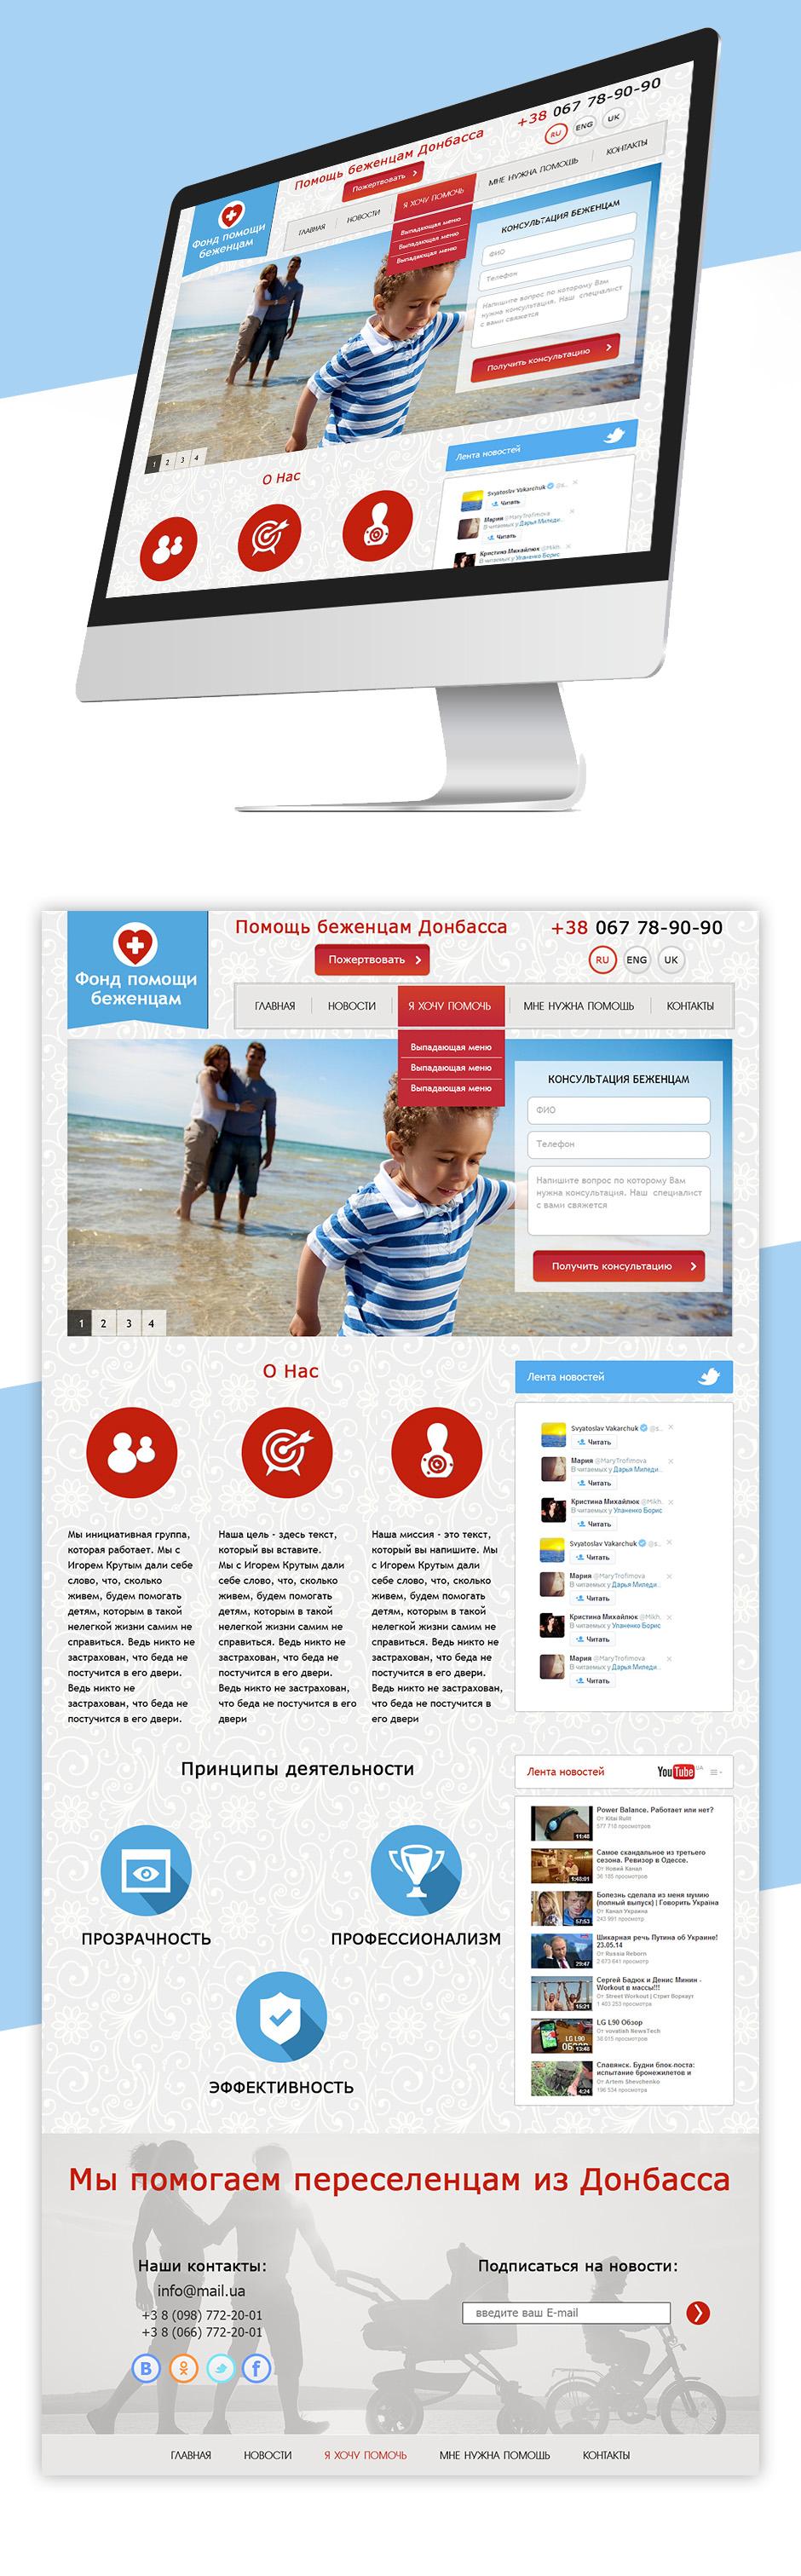 Сайт помощи беженцам Донбасса.